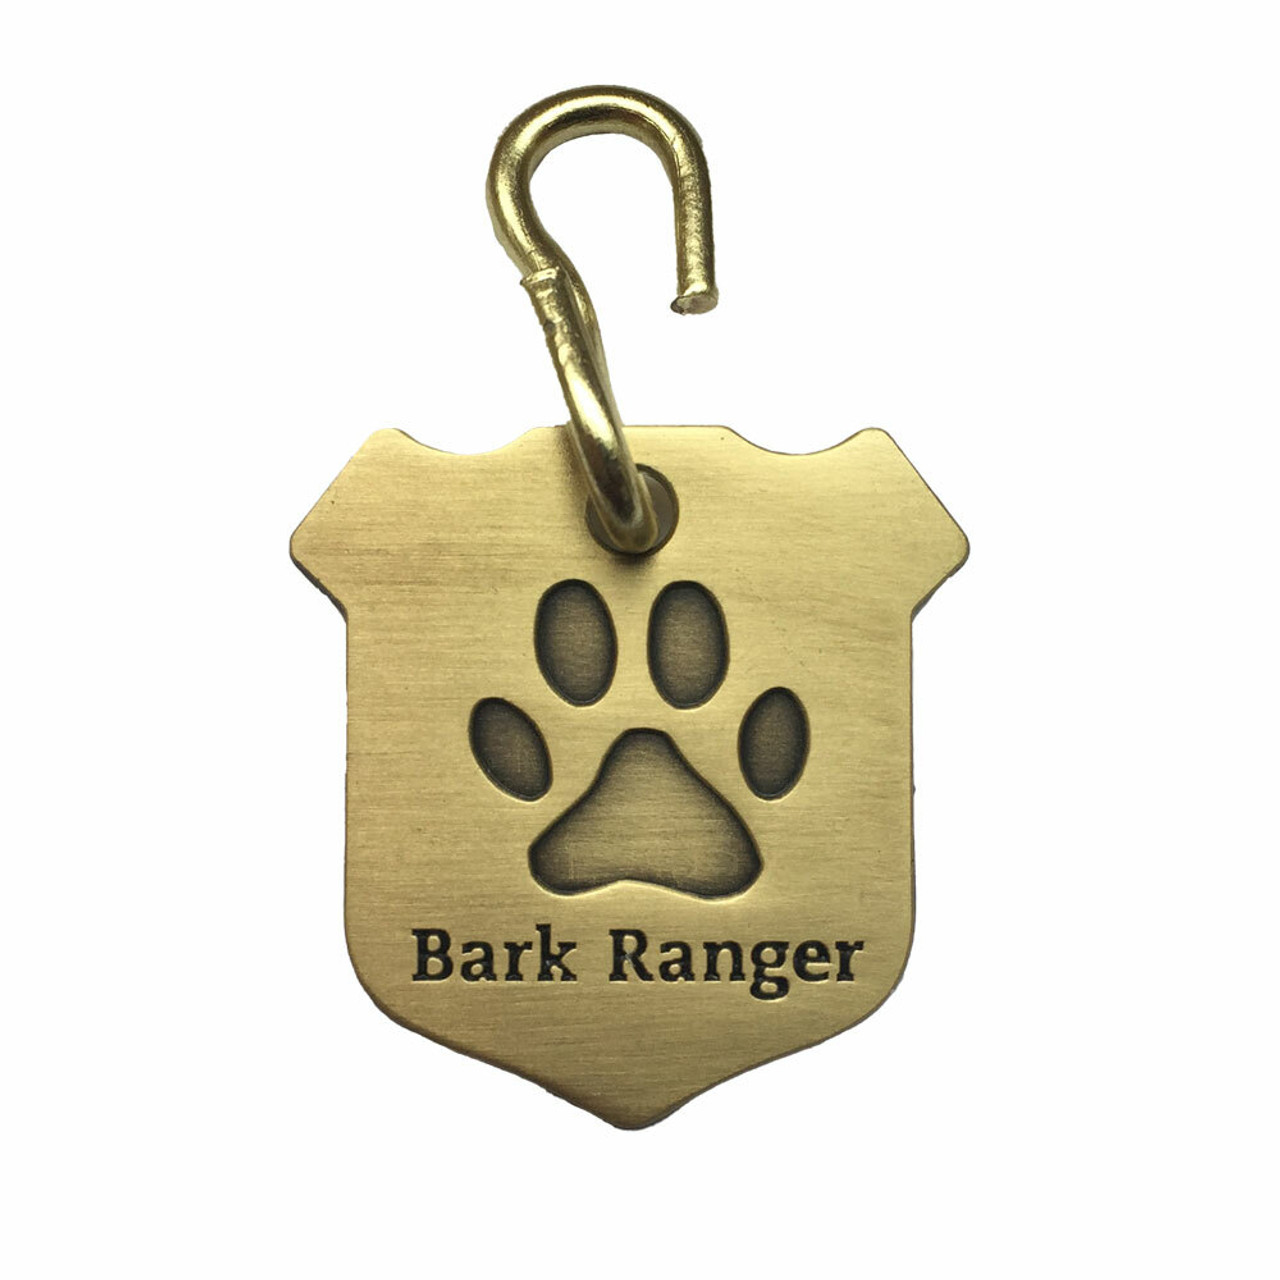 B.A.R.K. Ranger